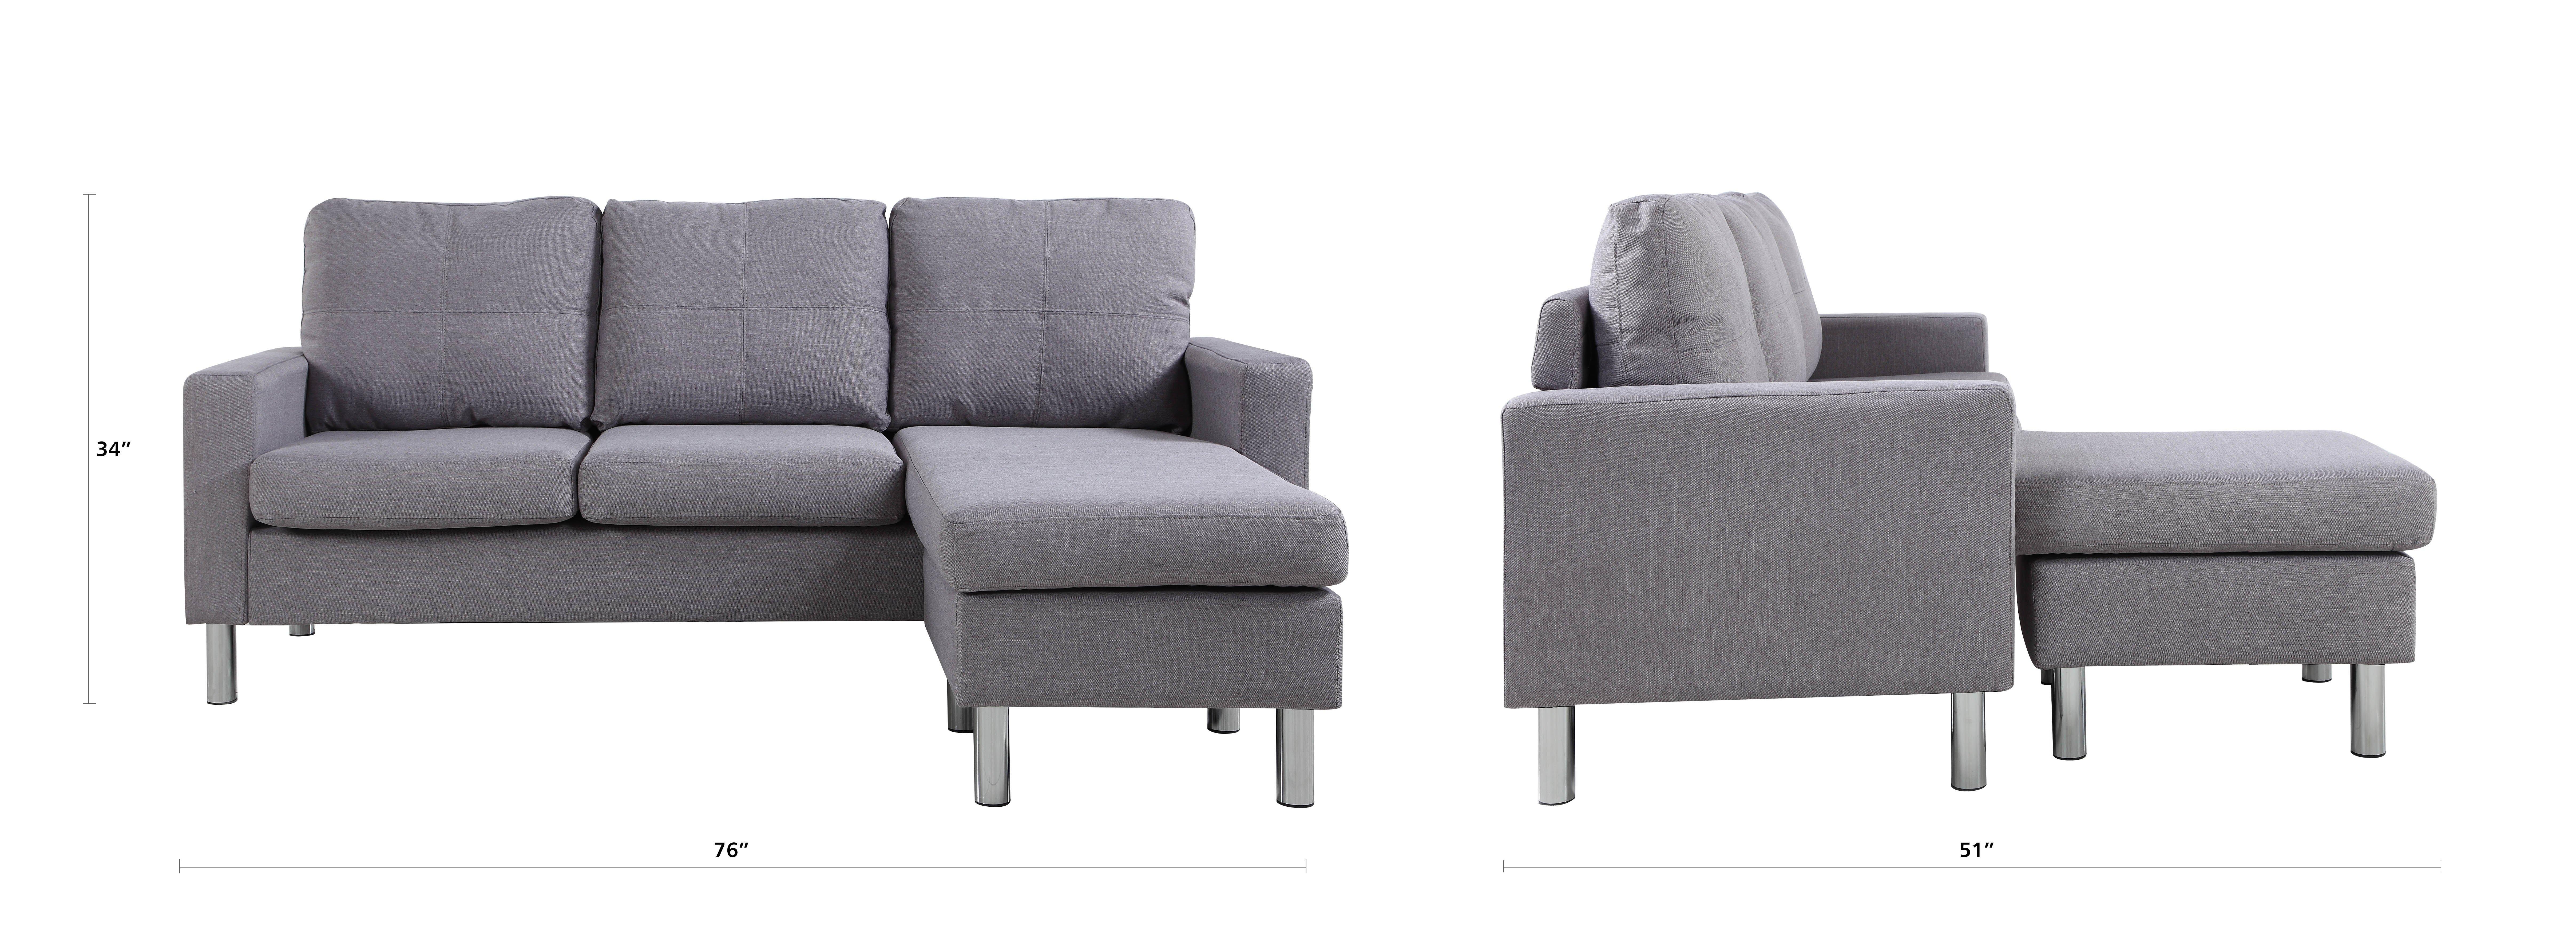 Modern Living Reversible Fabric Sectional Sofa Light Grey